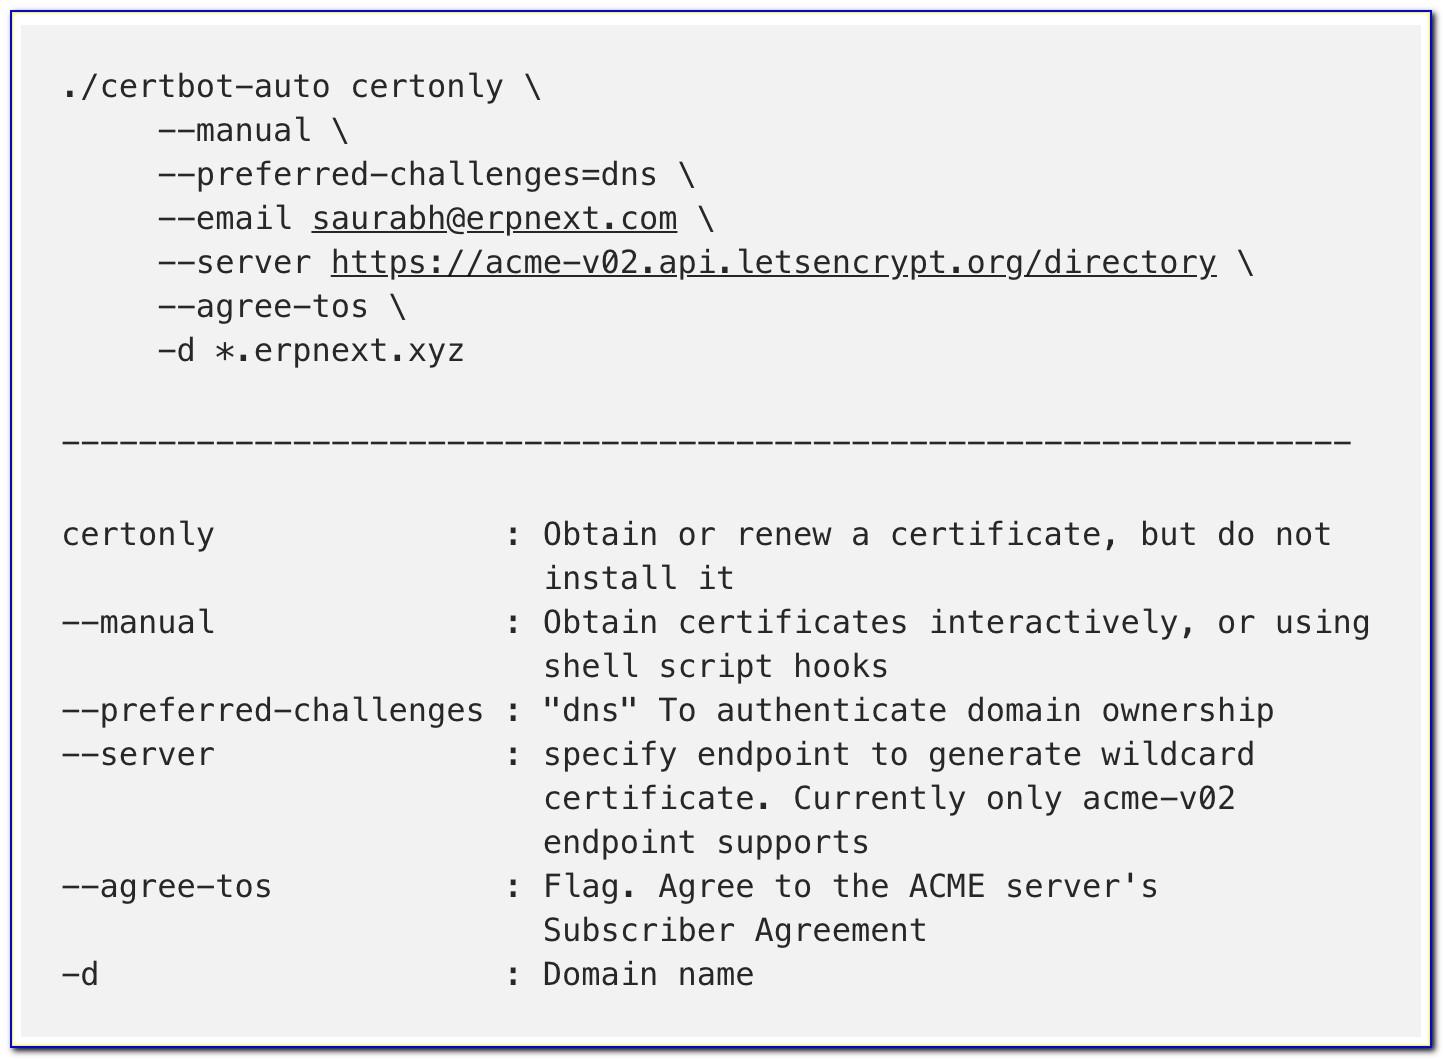 Letsencrypt Wildcard Certificate Not Working